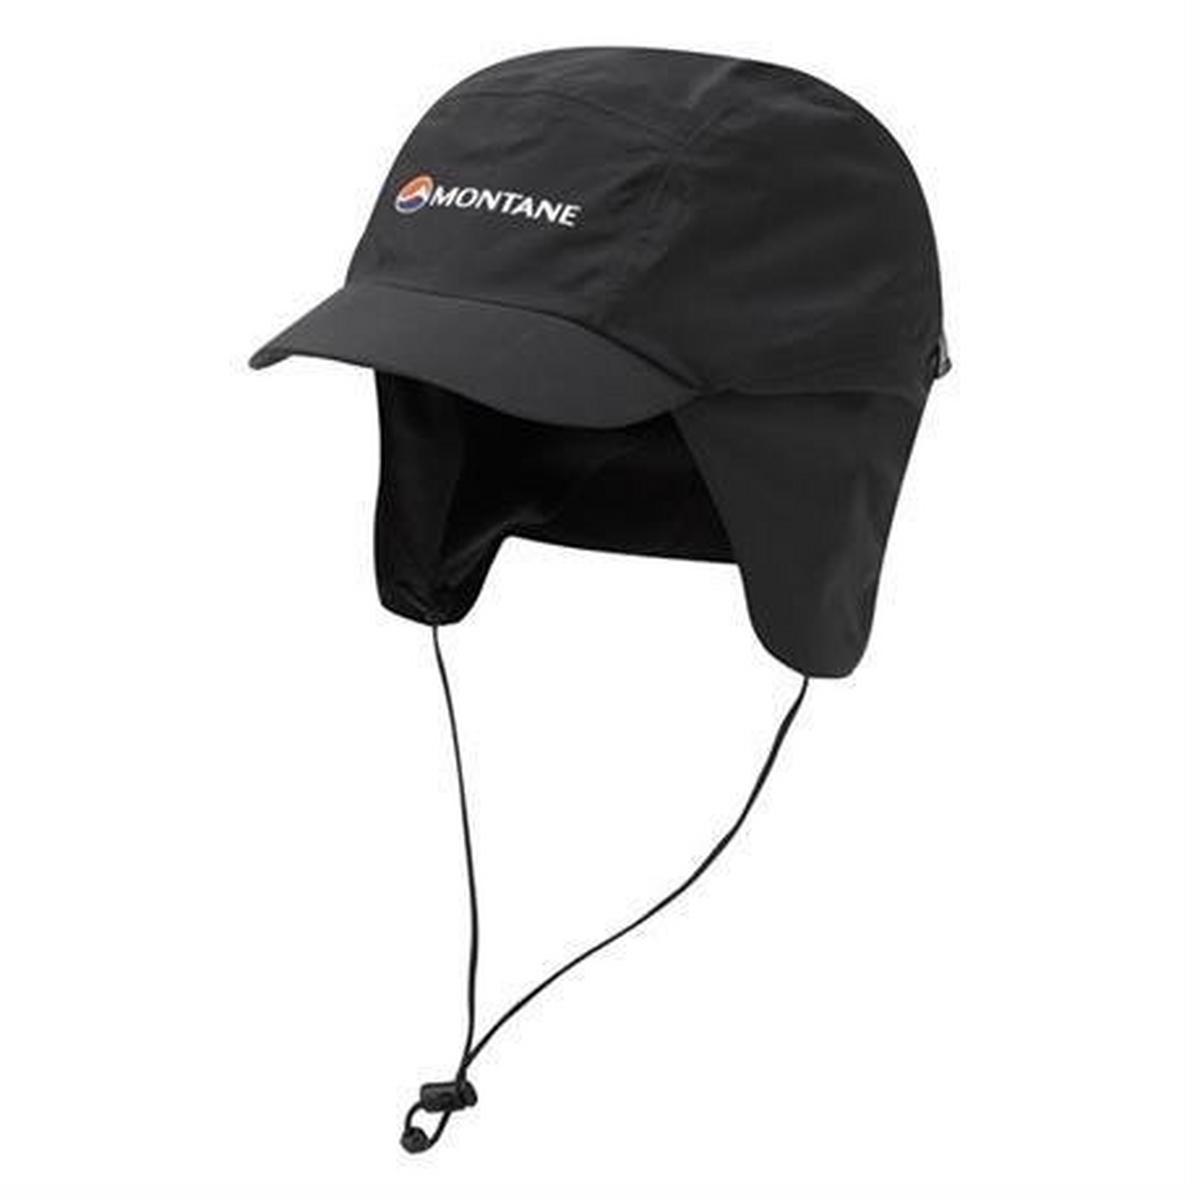 Montane Unisex Montane Mountain Squall Cap - Black